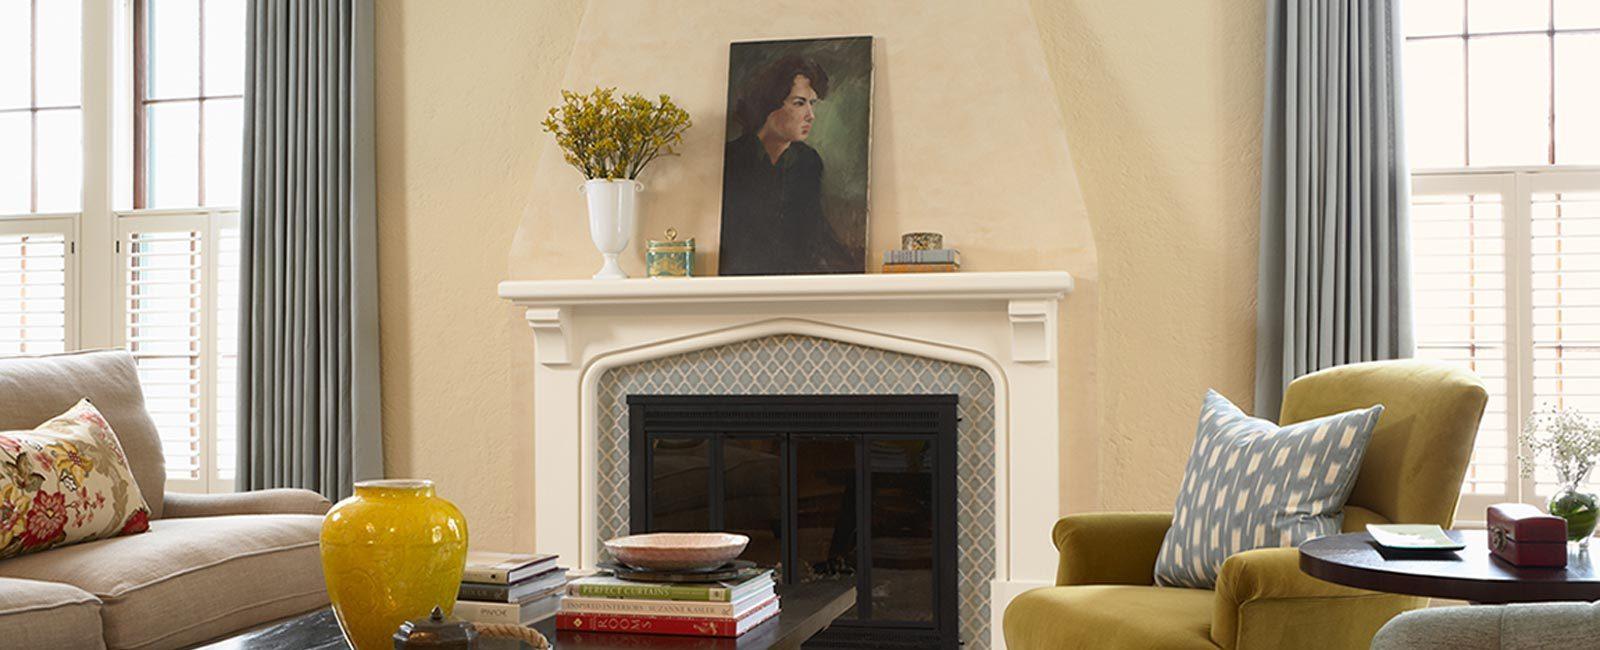 Interior Design  tiled fireplace